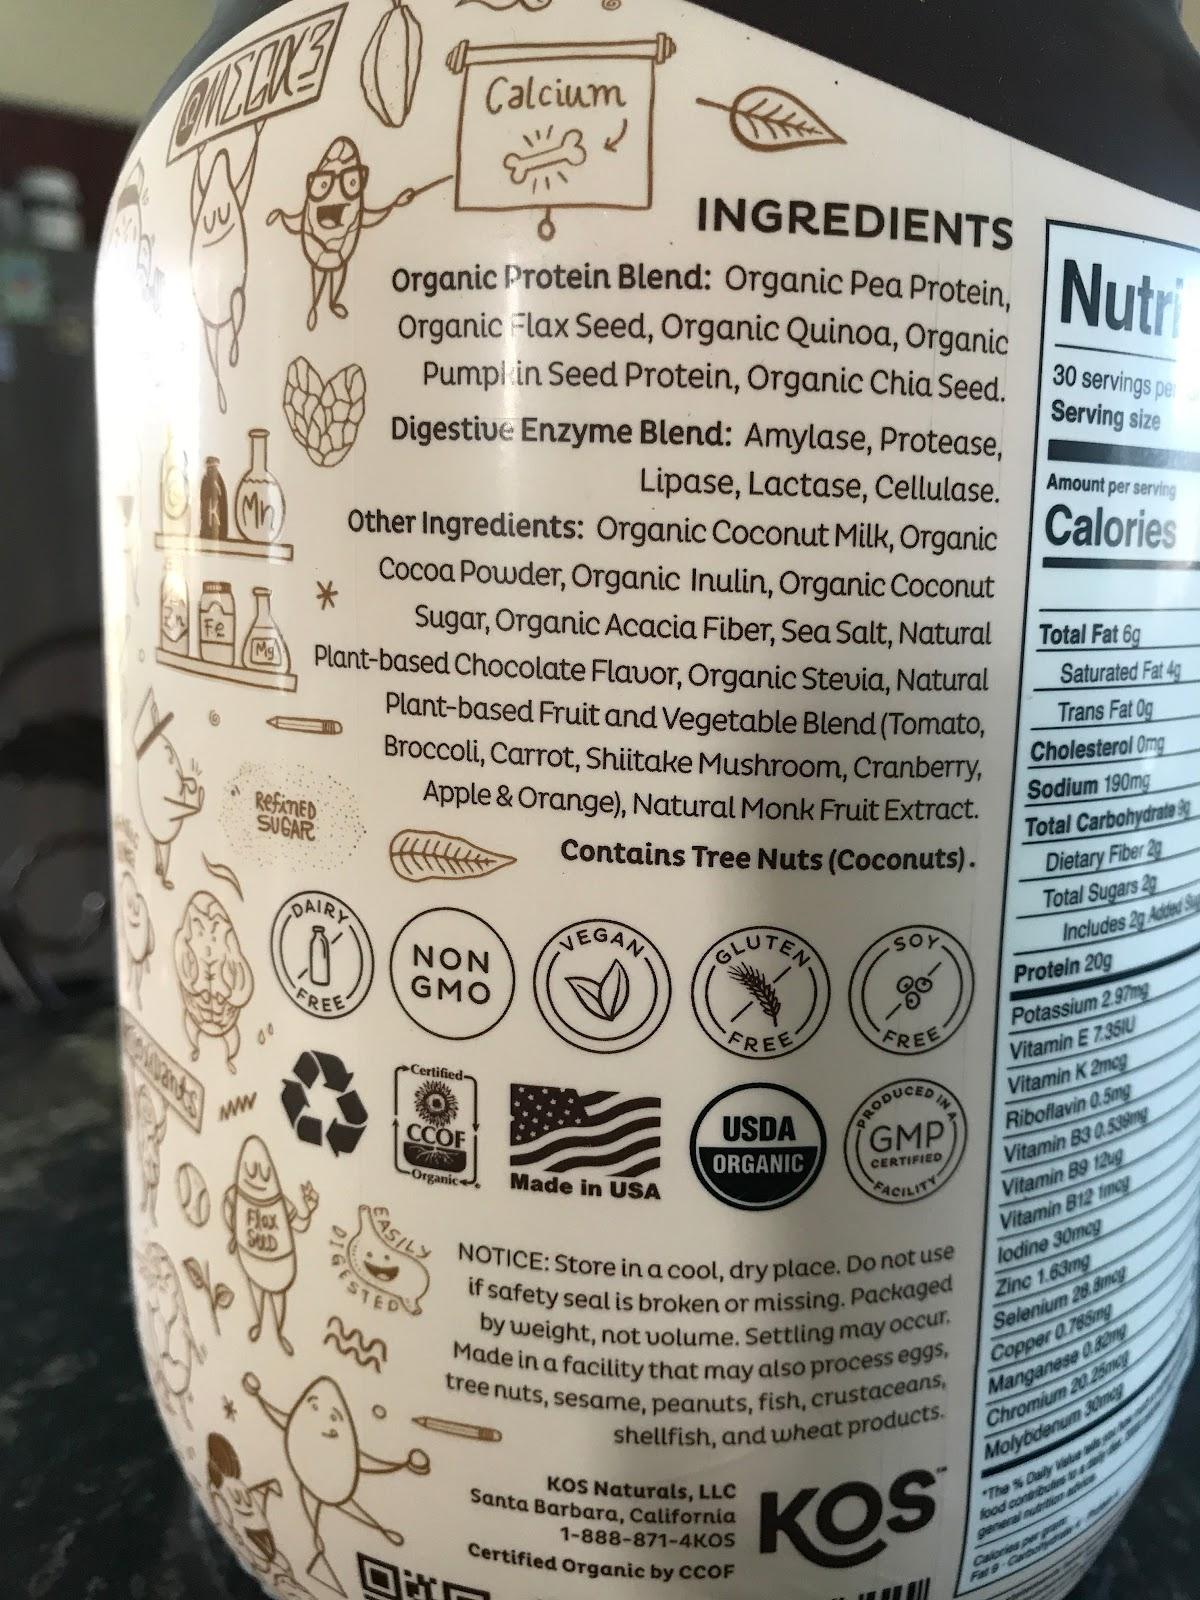 KOS Plant Protein ingredients list.